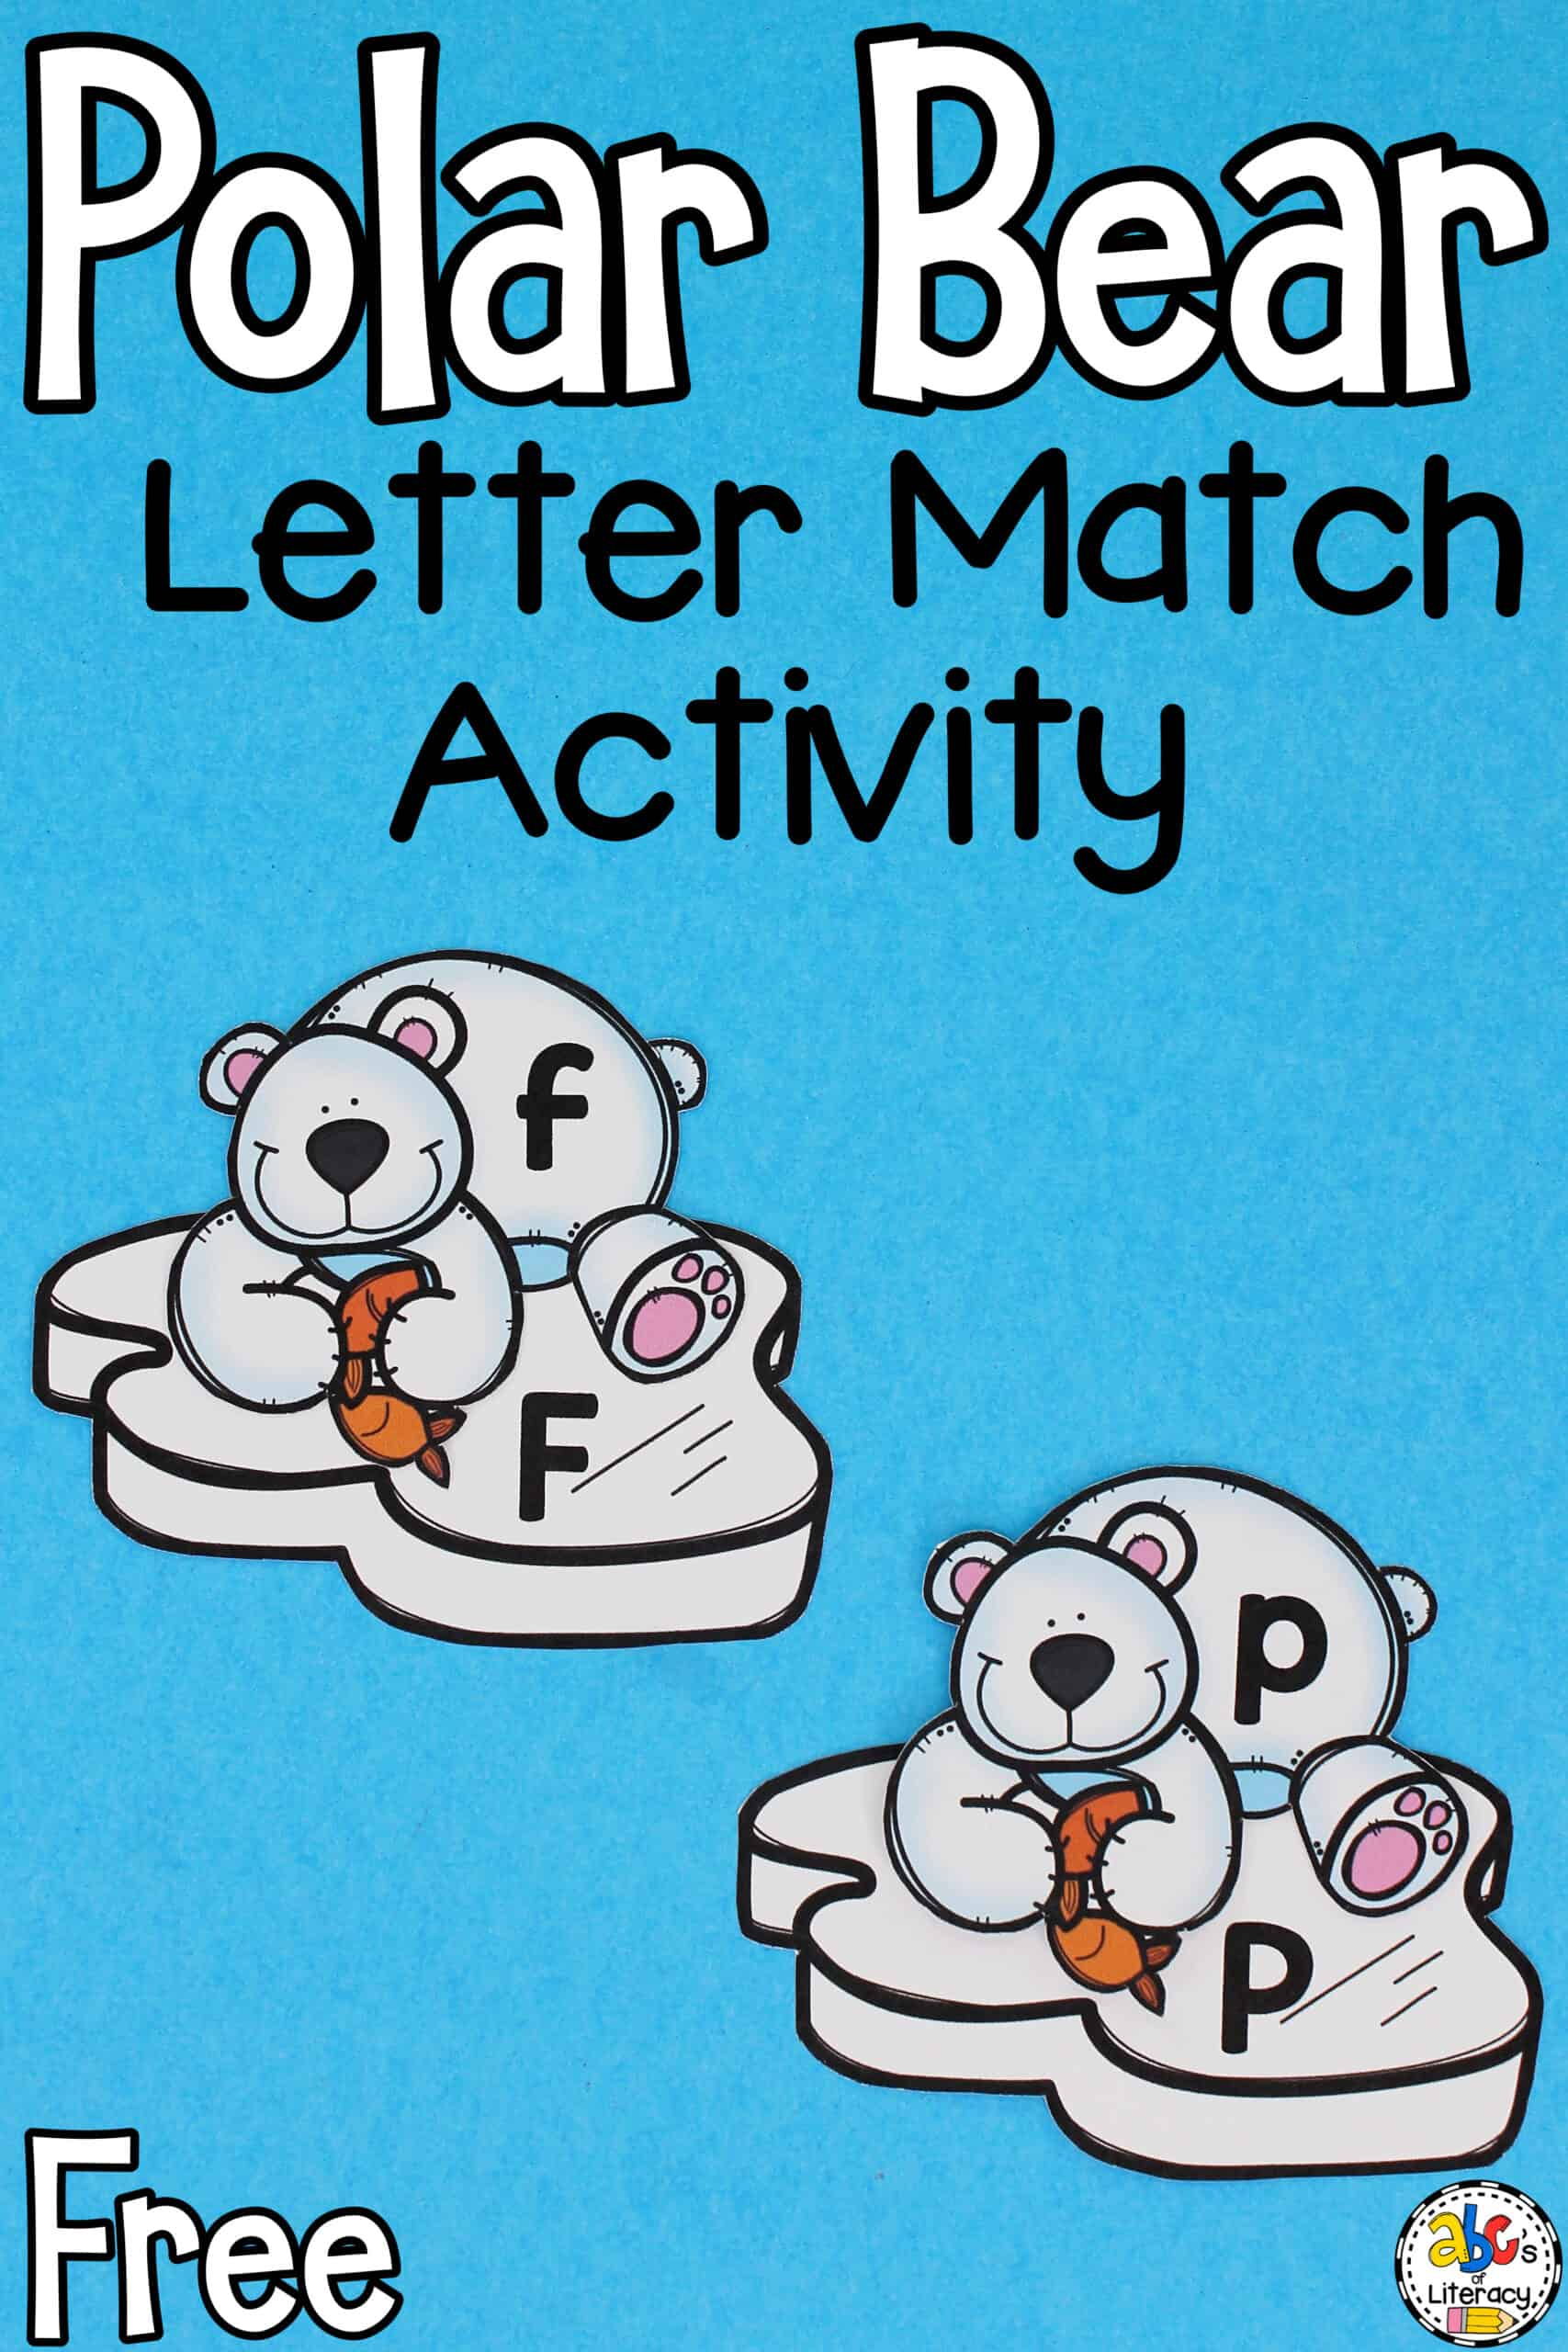 Polar Bear Letter Match Activity